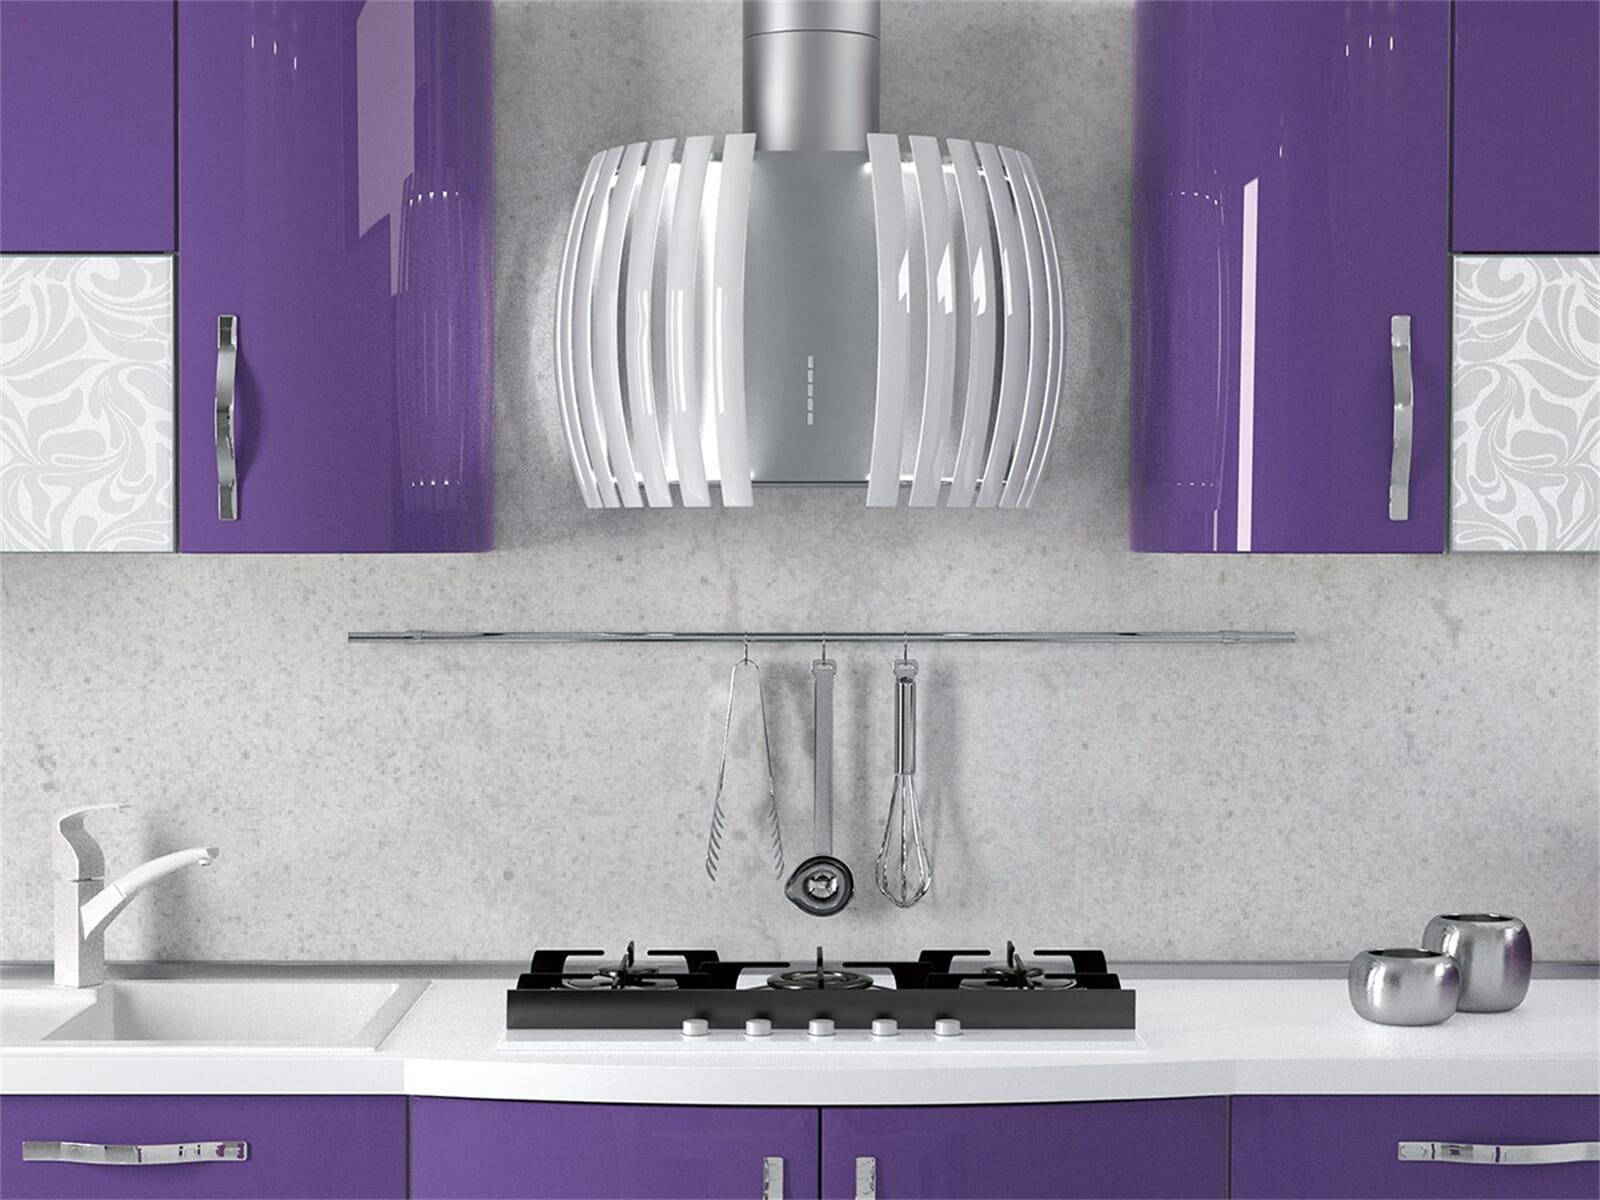 falmec prestige wand dunstabzugshaube wei f r 2213 10 eur. Black Bedroom Furniture Sets. Home Design Ideas